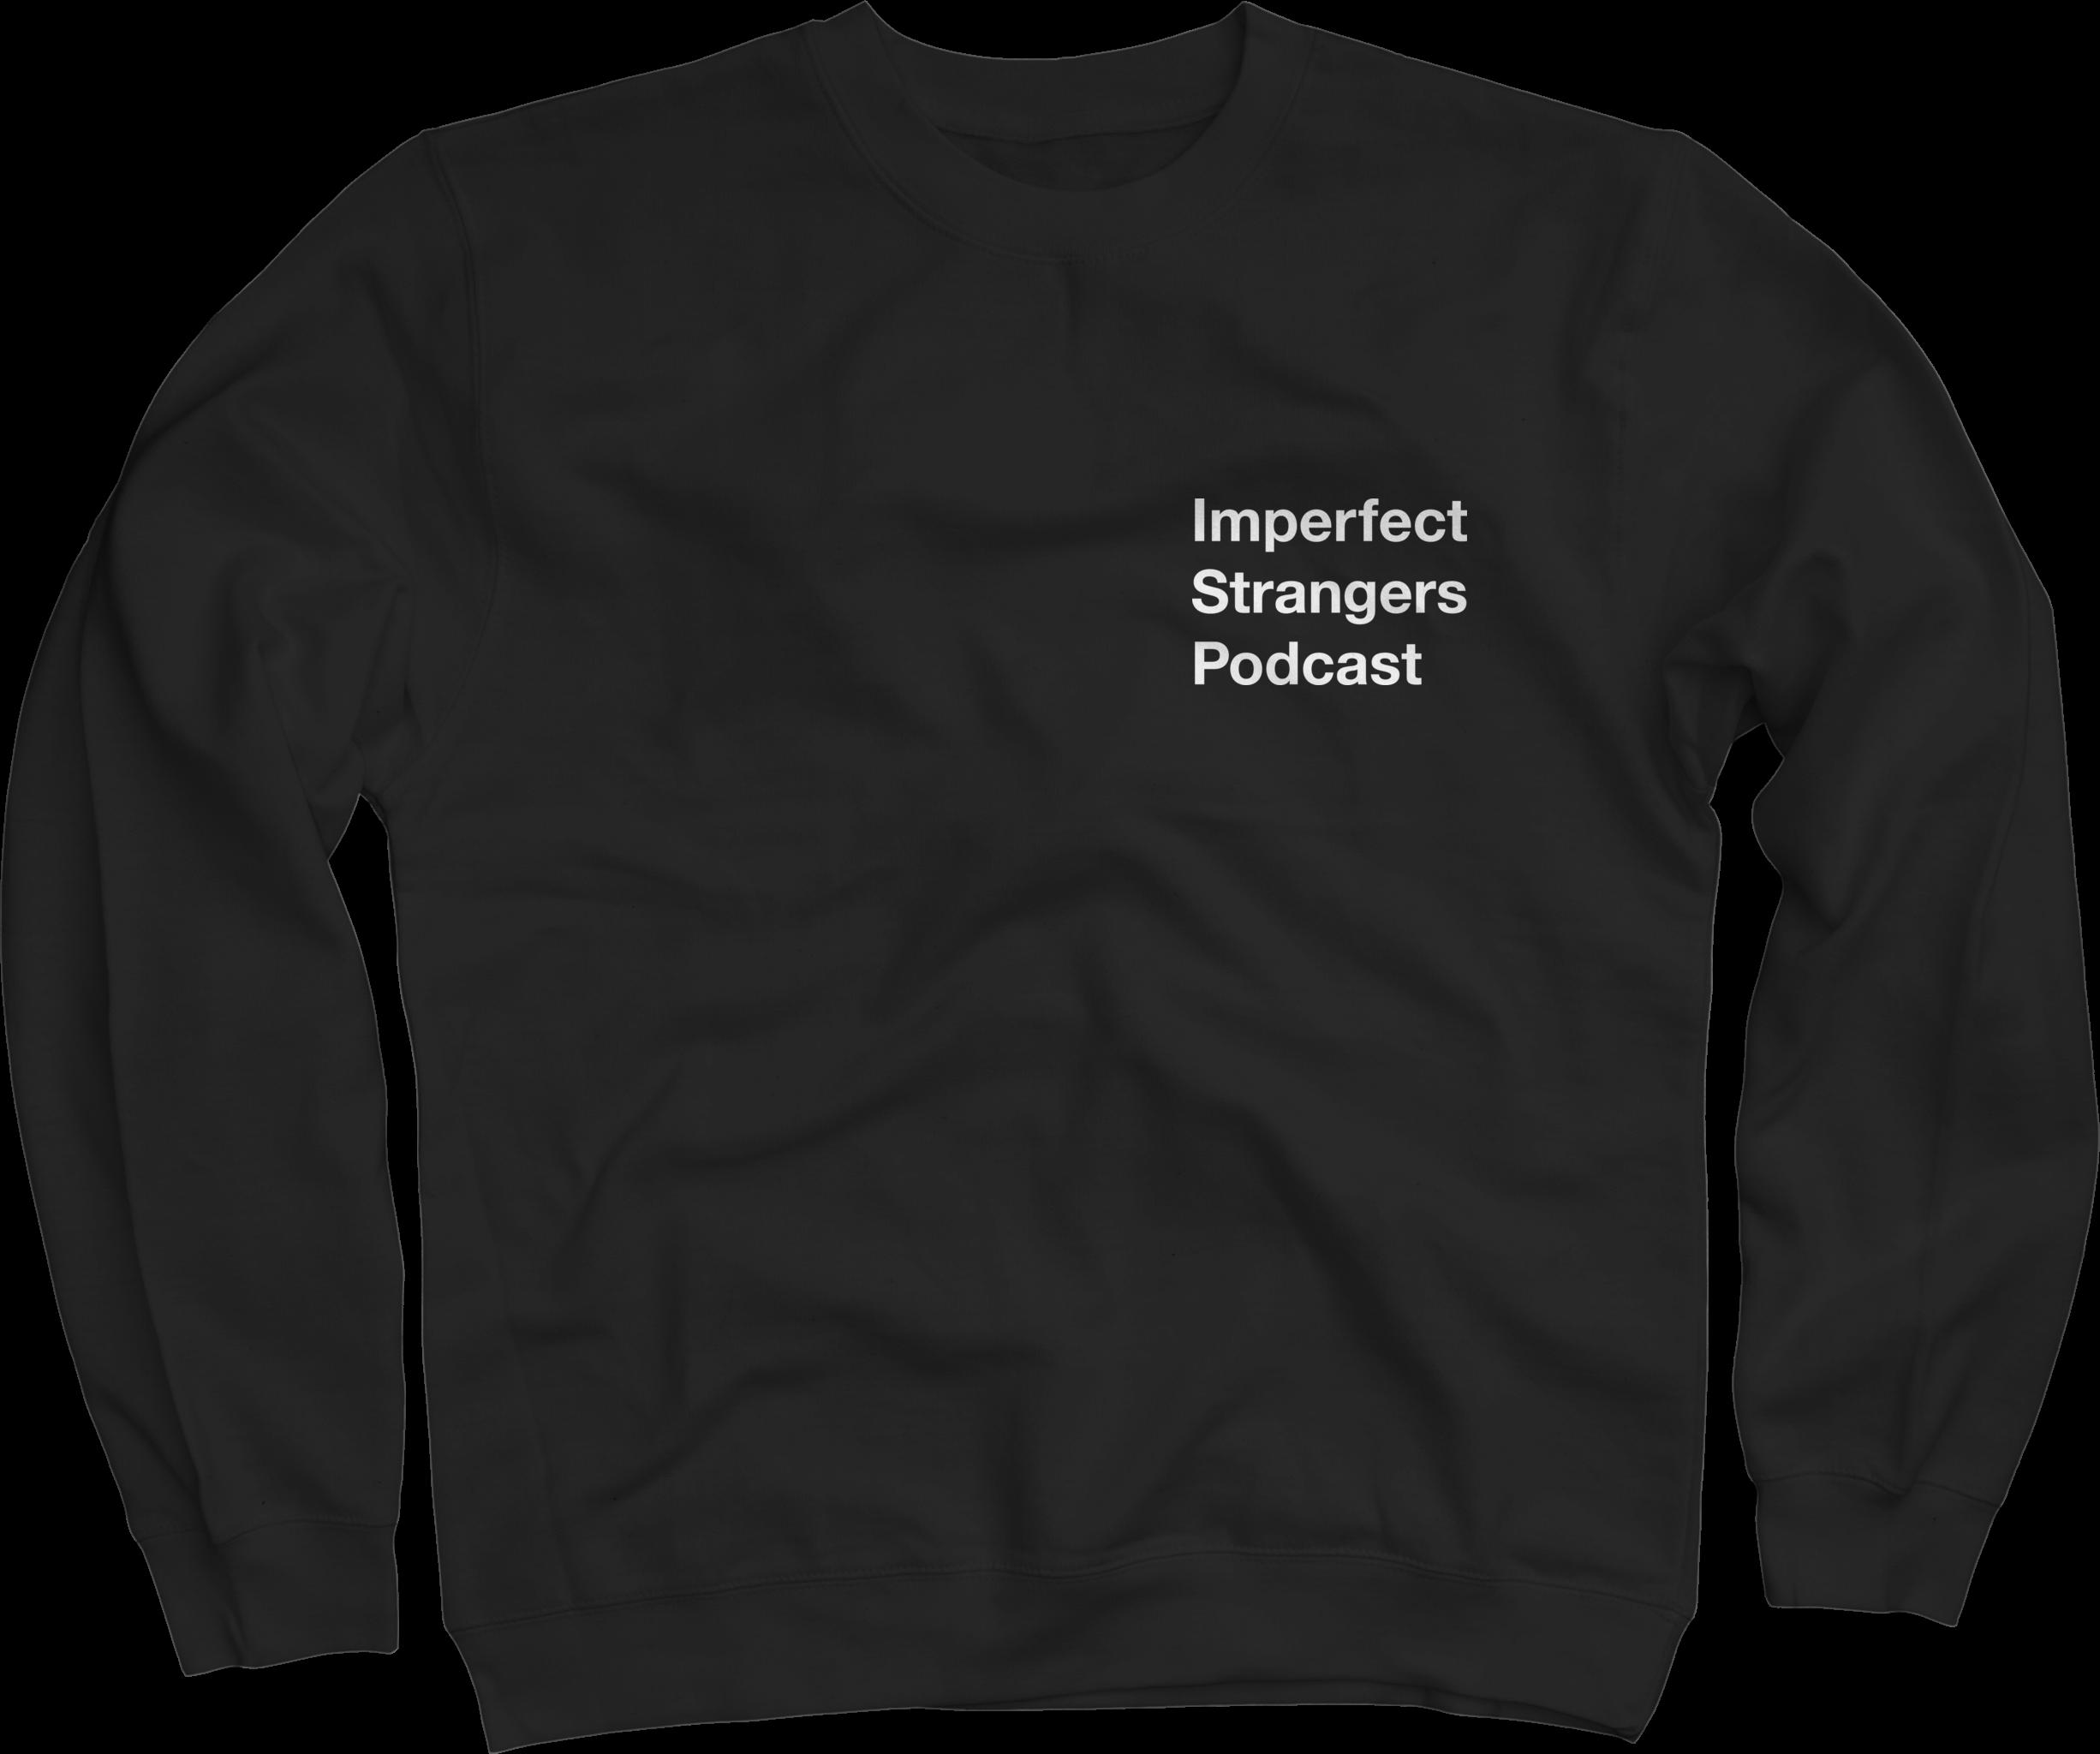 Imperfect Strangers Podcast